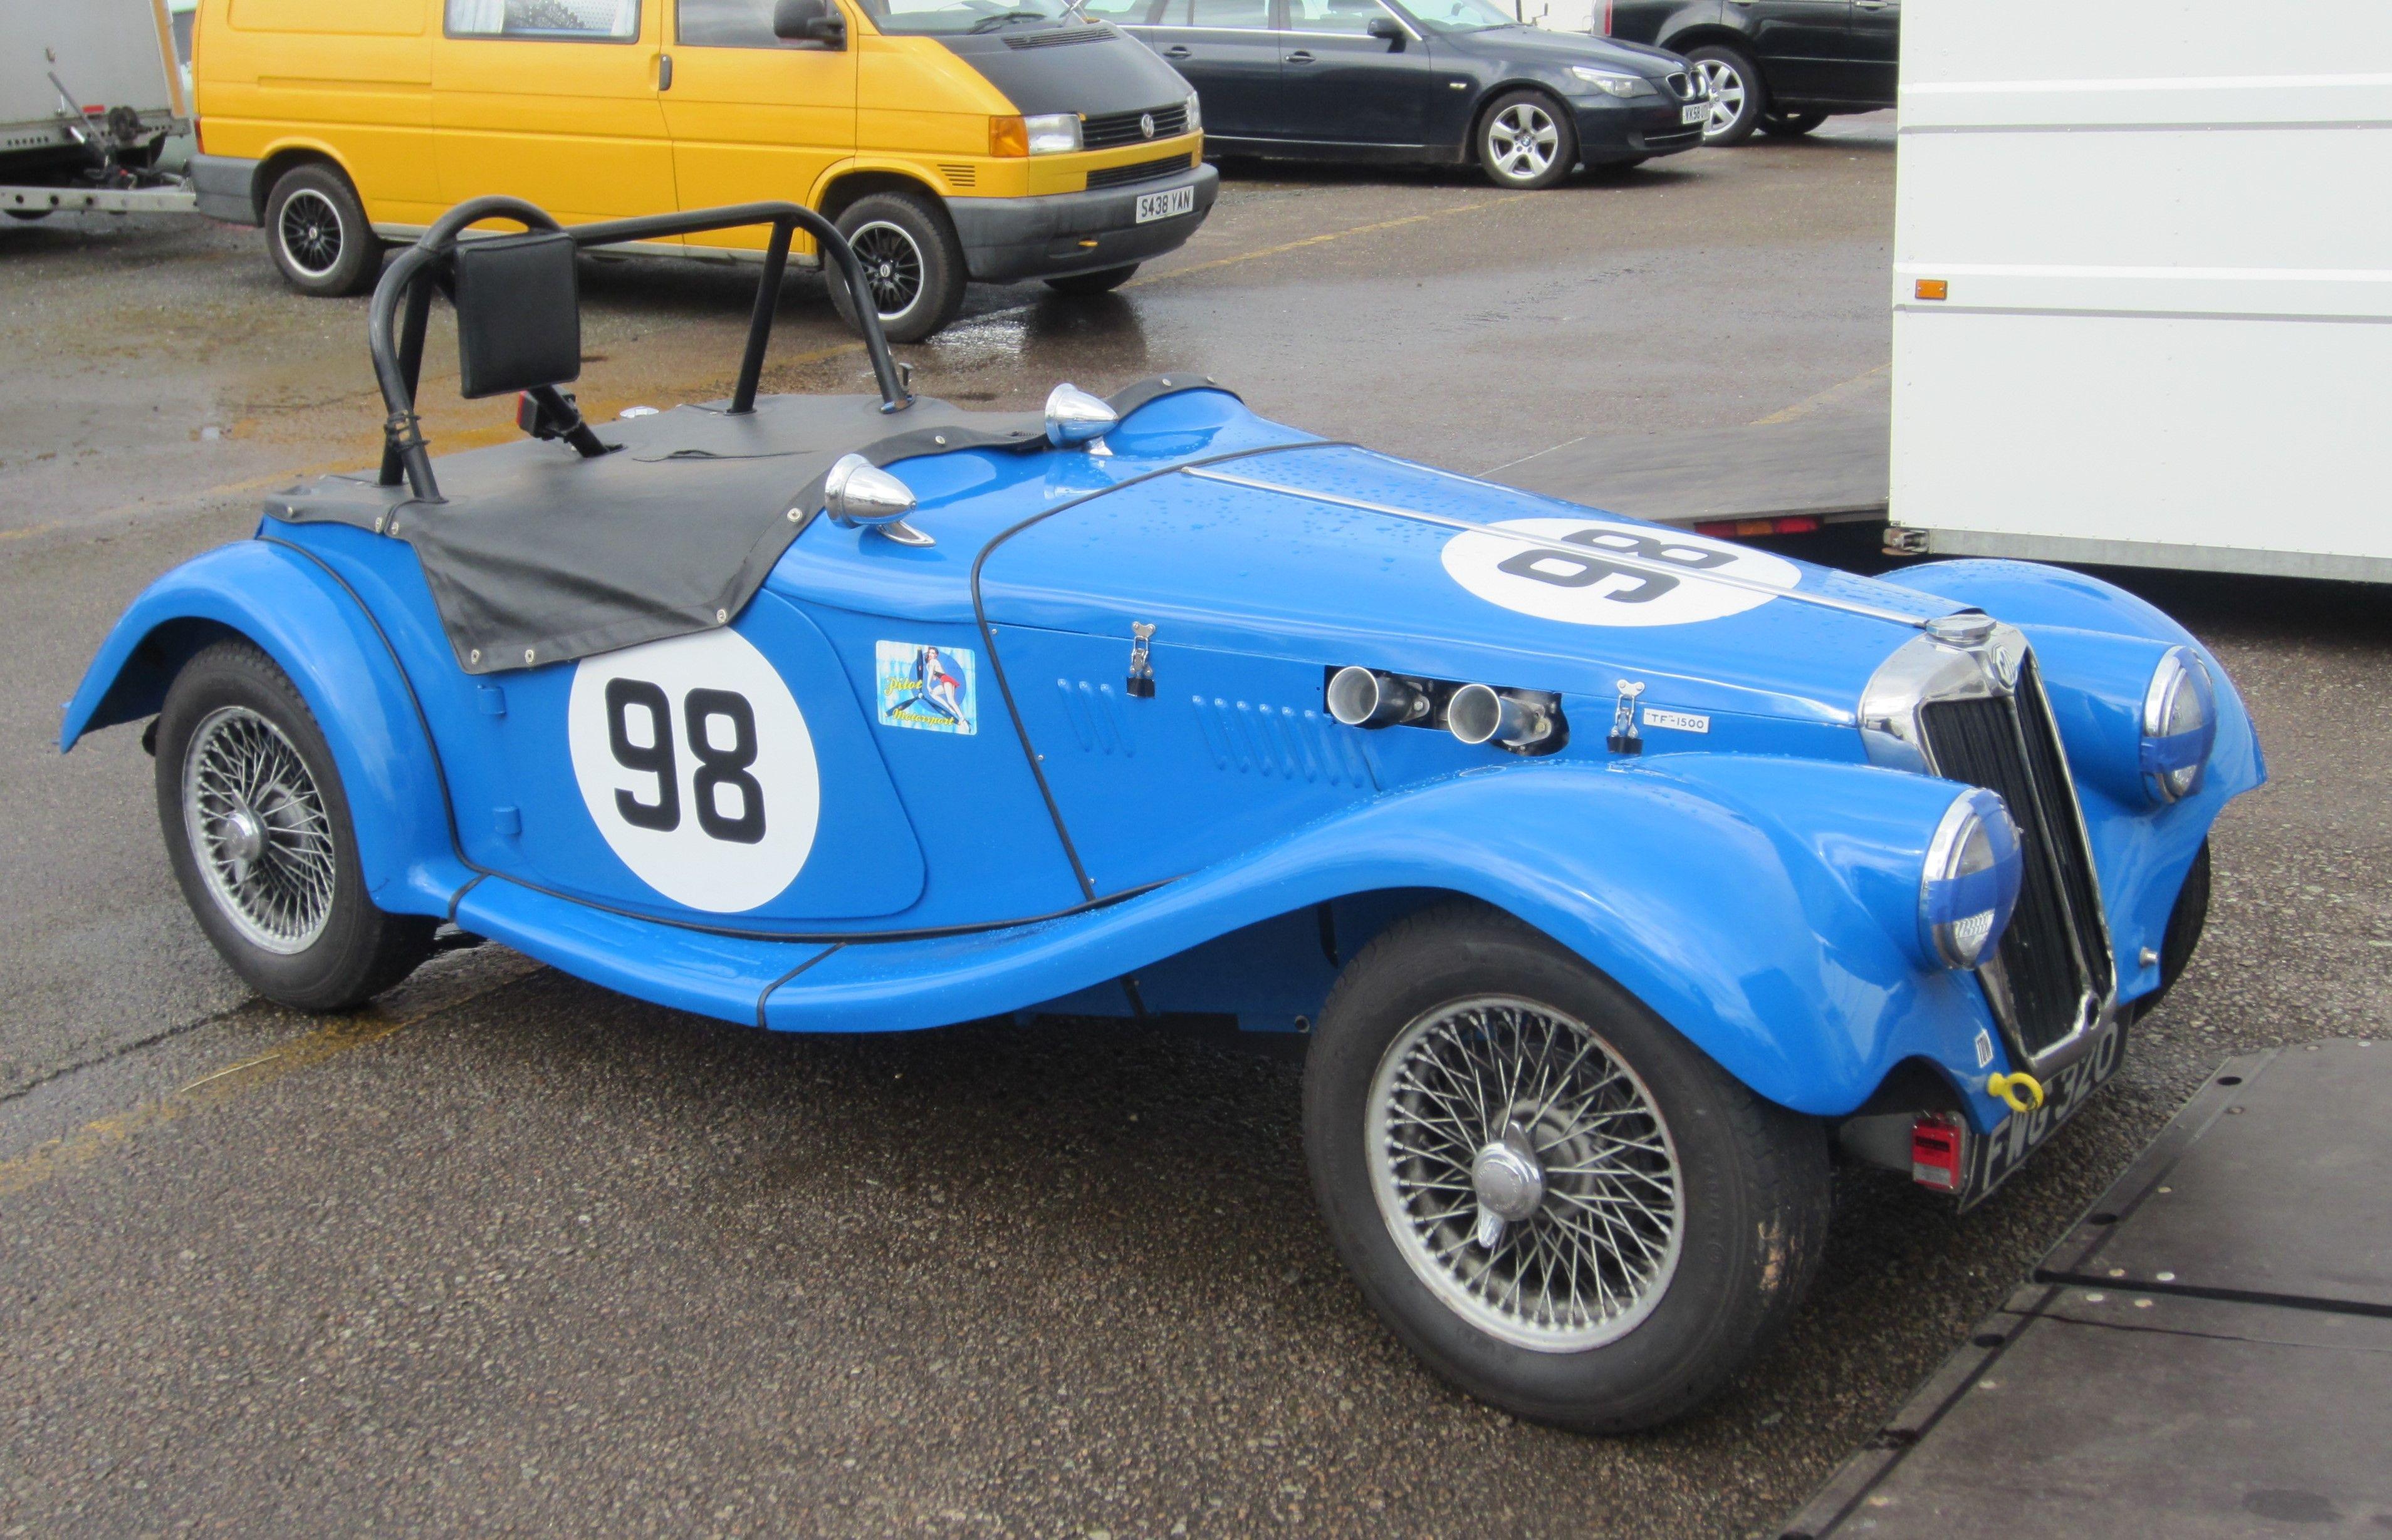 Class mg ttypes racing open wheel racing car